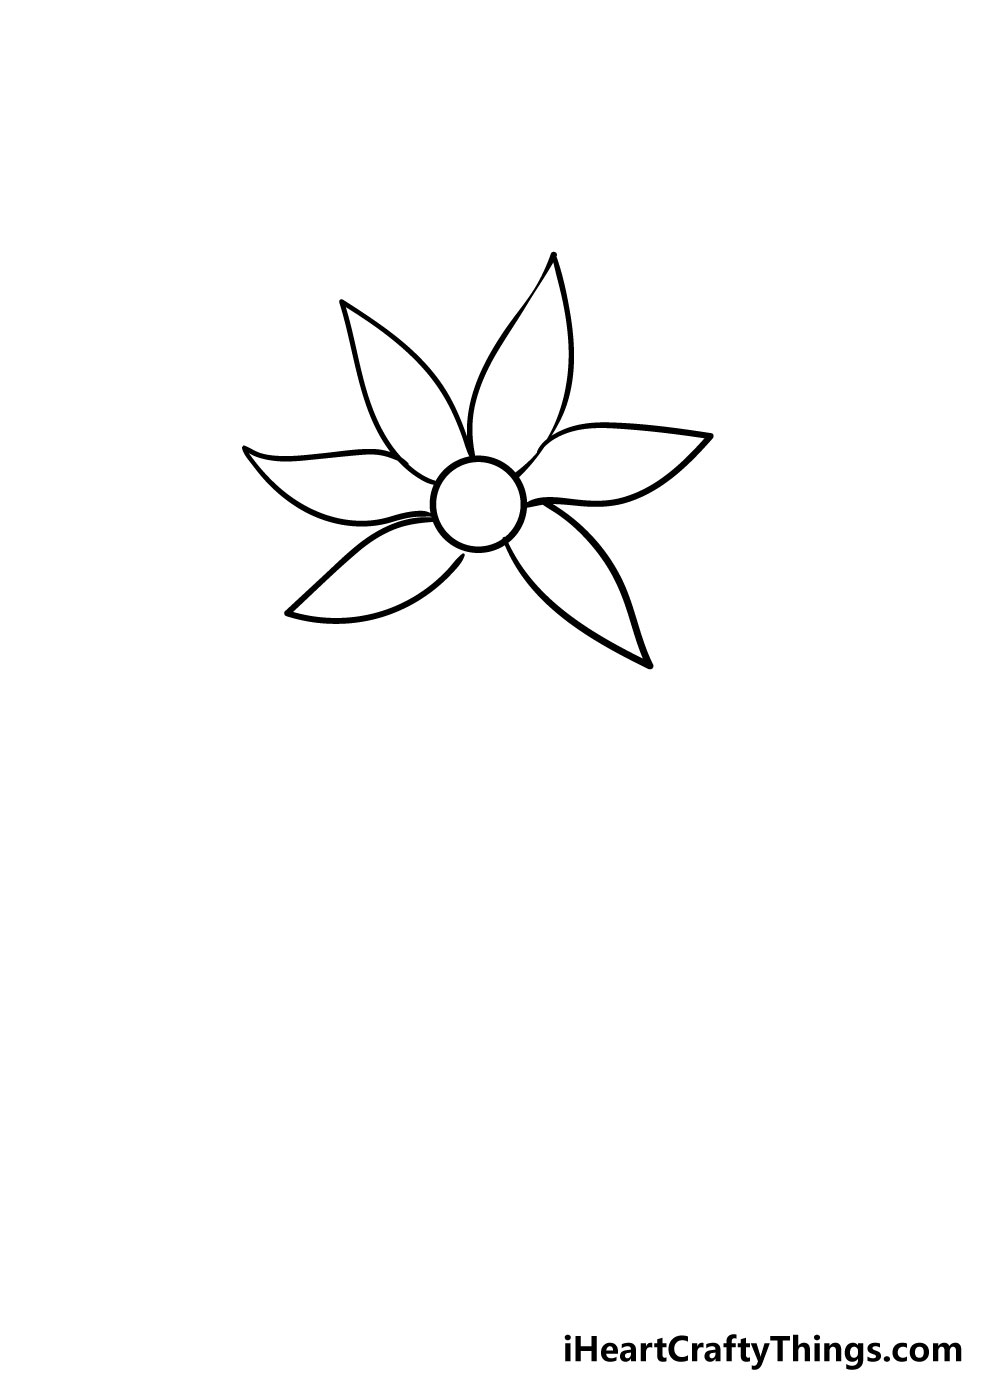 flower drawing step 5